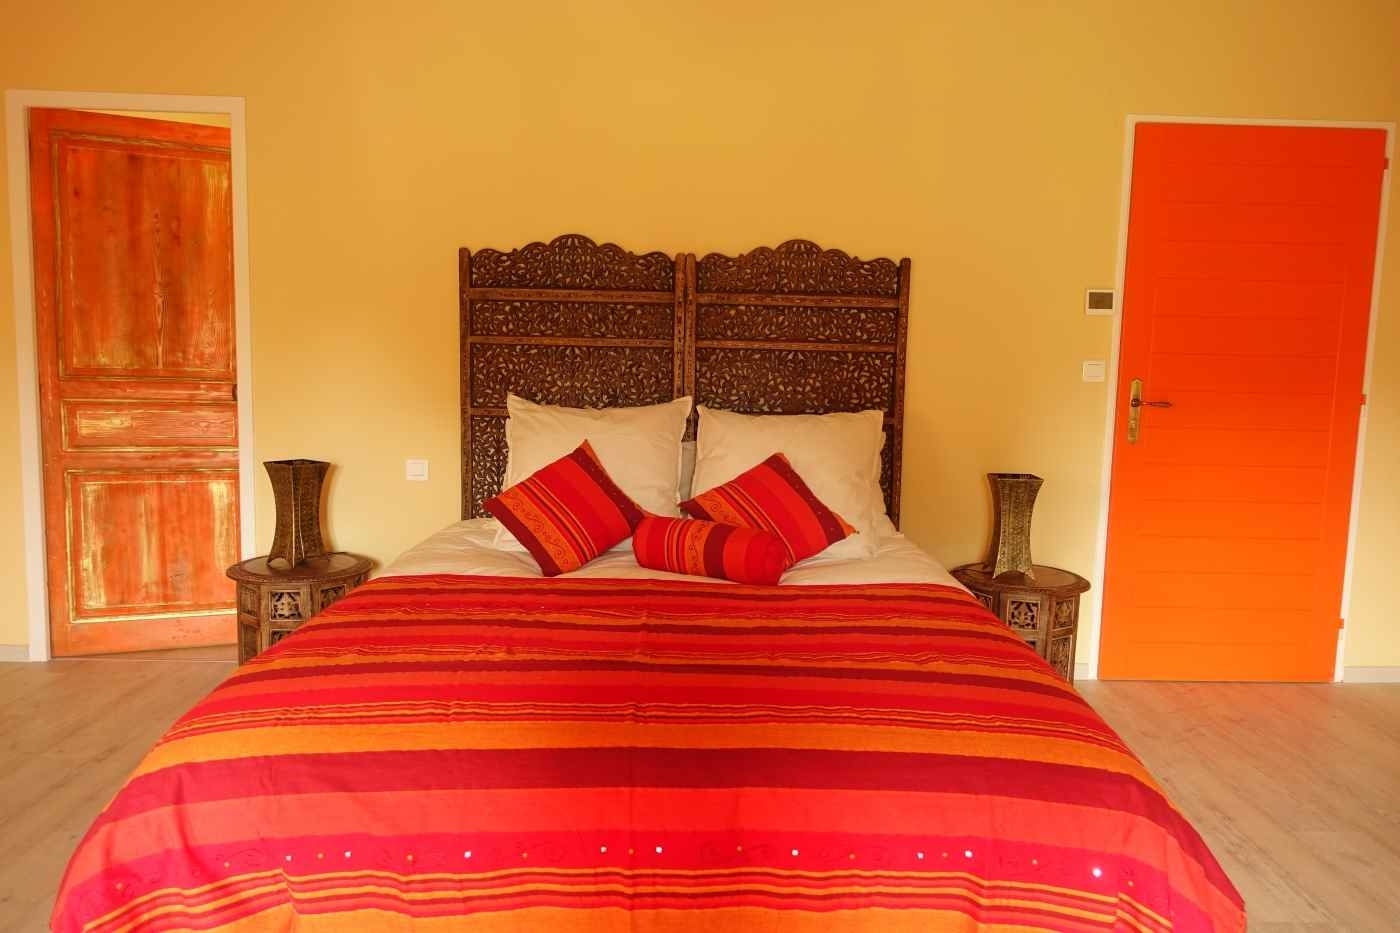 chambre safran chambre d 39 h tes cologique de charme albi tarn occitanie brin de cocagne. Black Bedroom Furniture Sets. Home Design Ideas